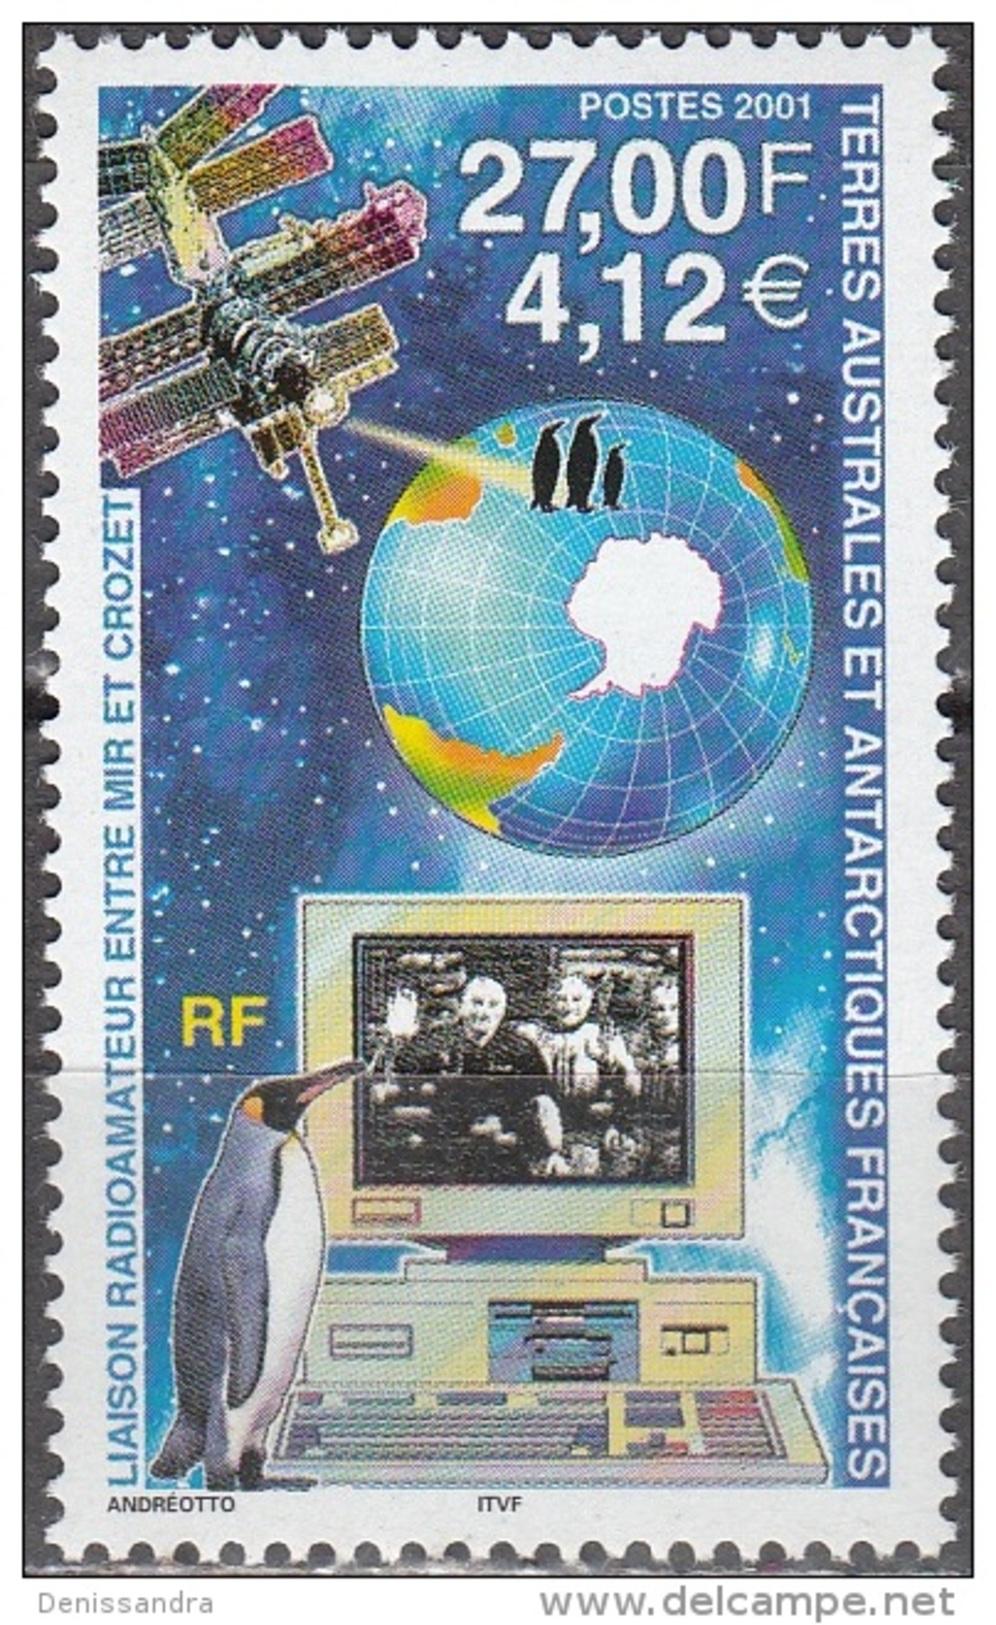 TAAF 2001 Yvert 295 Neuf ** Cote (2015) 14.00 Euro Liaison Radioamateur Entre Mir Et Crozet - Neufs